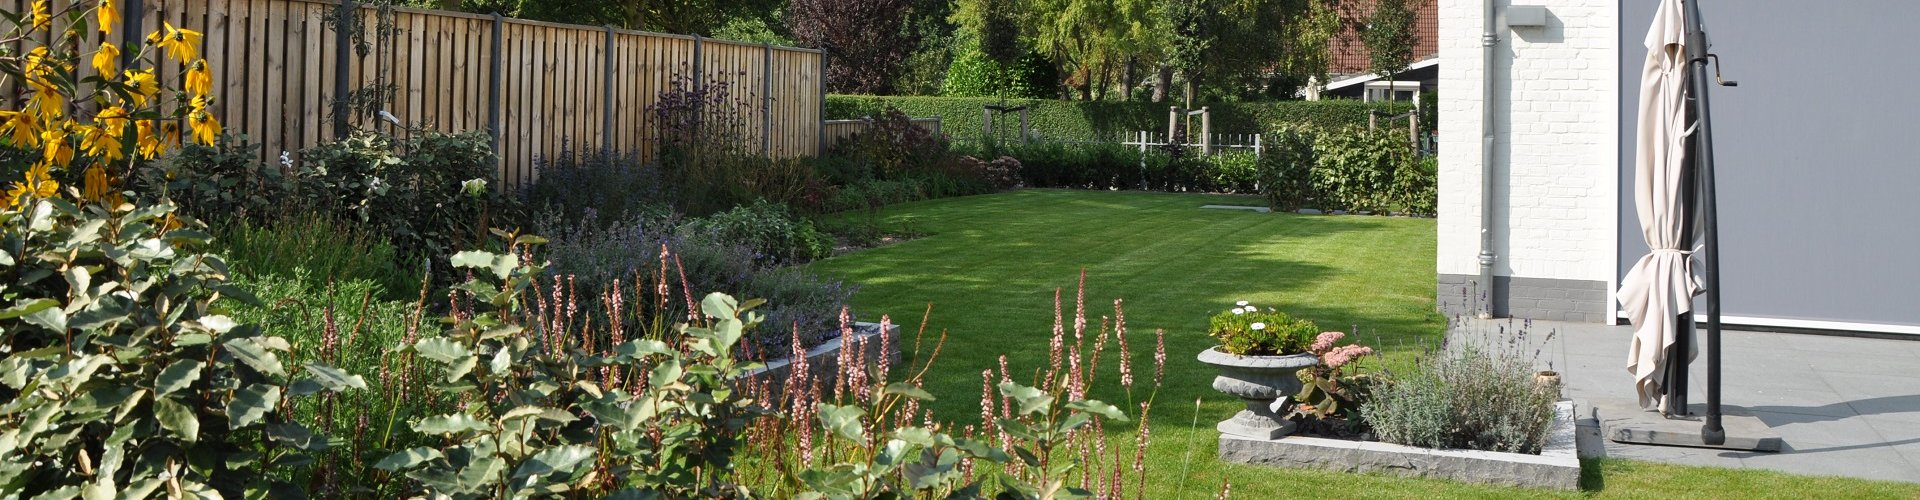 Mooie tuin